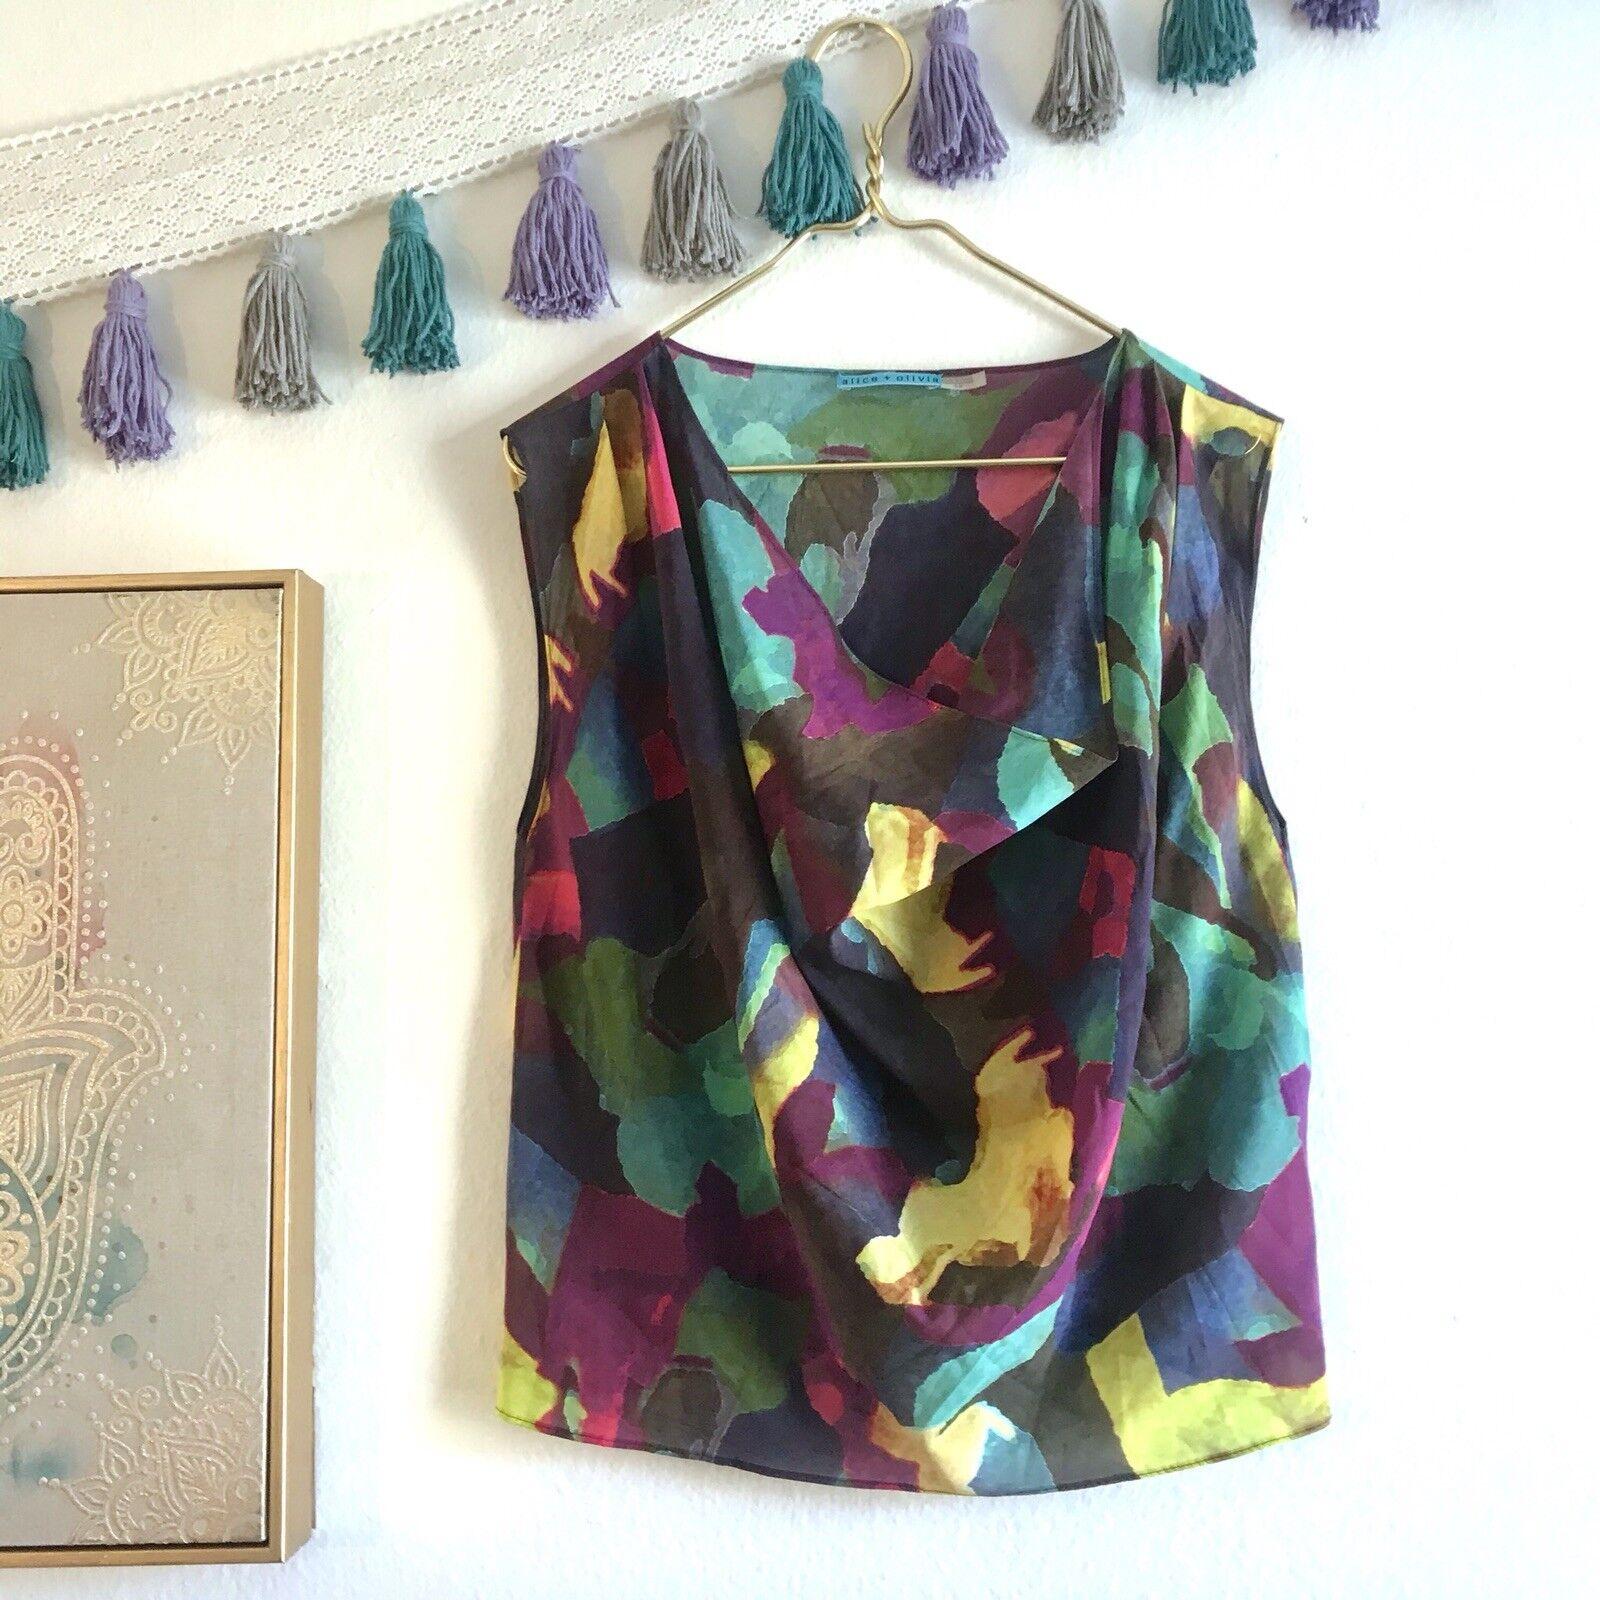 Alice +Olivia Drape Neck Silk Blouse 'Fall Abstract' lila Blau Grün Gelb